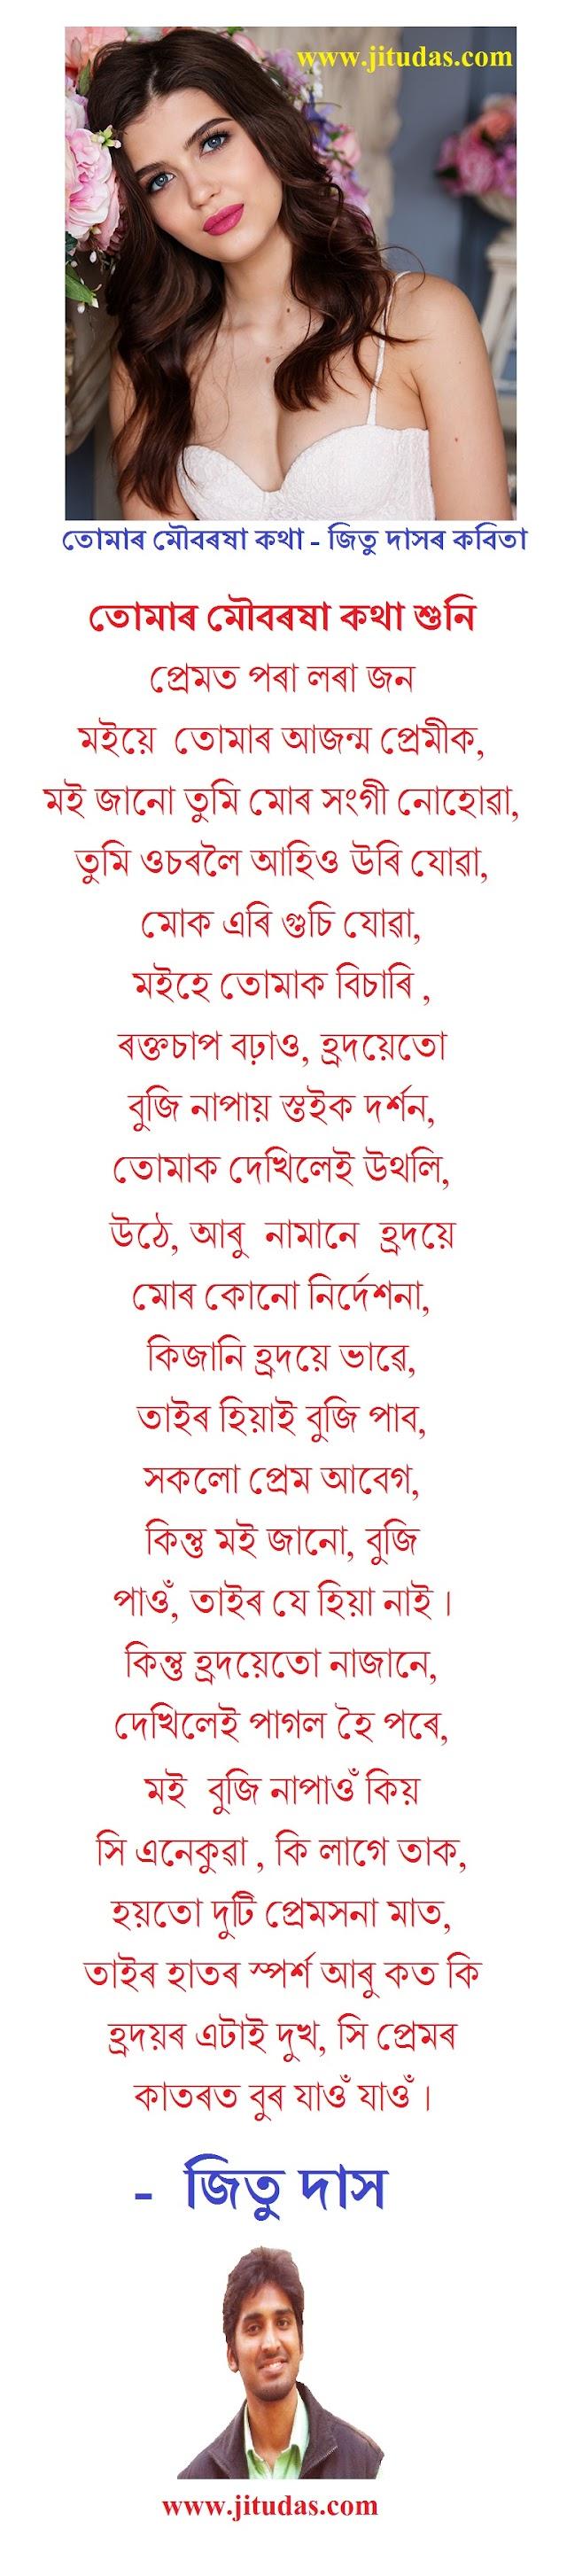 Assamese sad love poem and Shayari (  তোমাৰ মৌবৰষা কথা)  by Jitu Das poems 2017